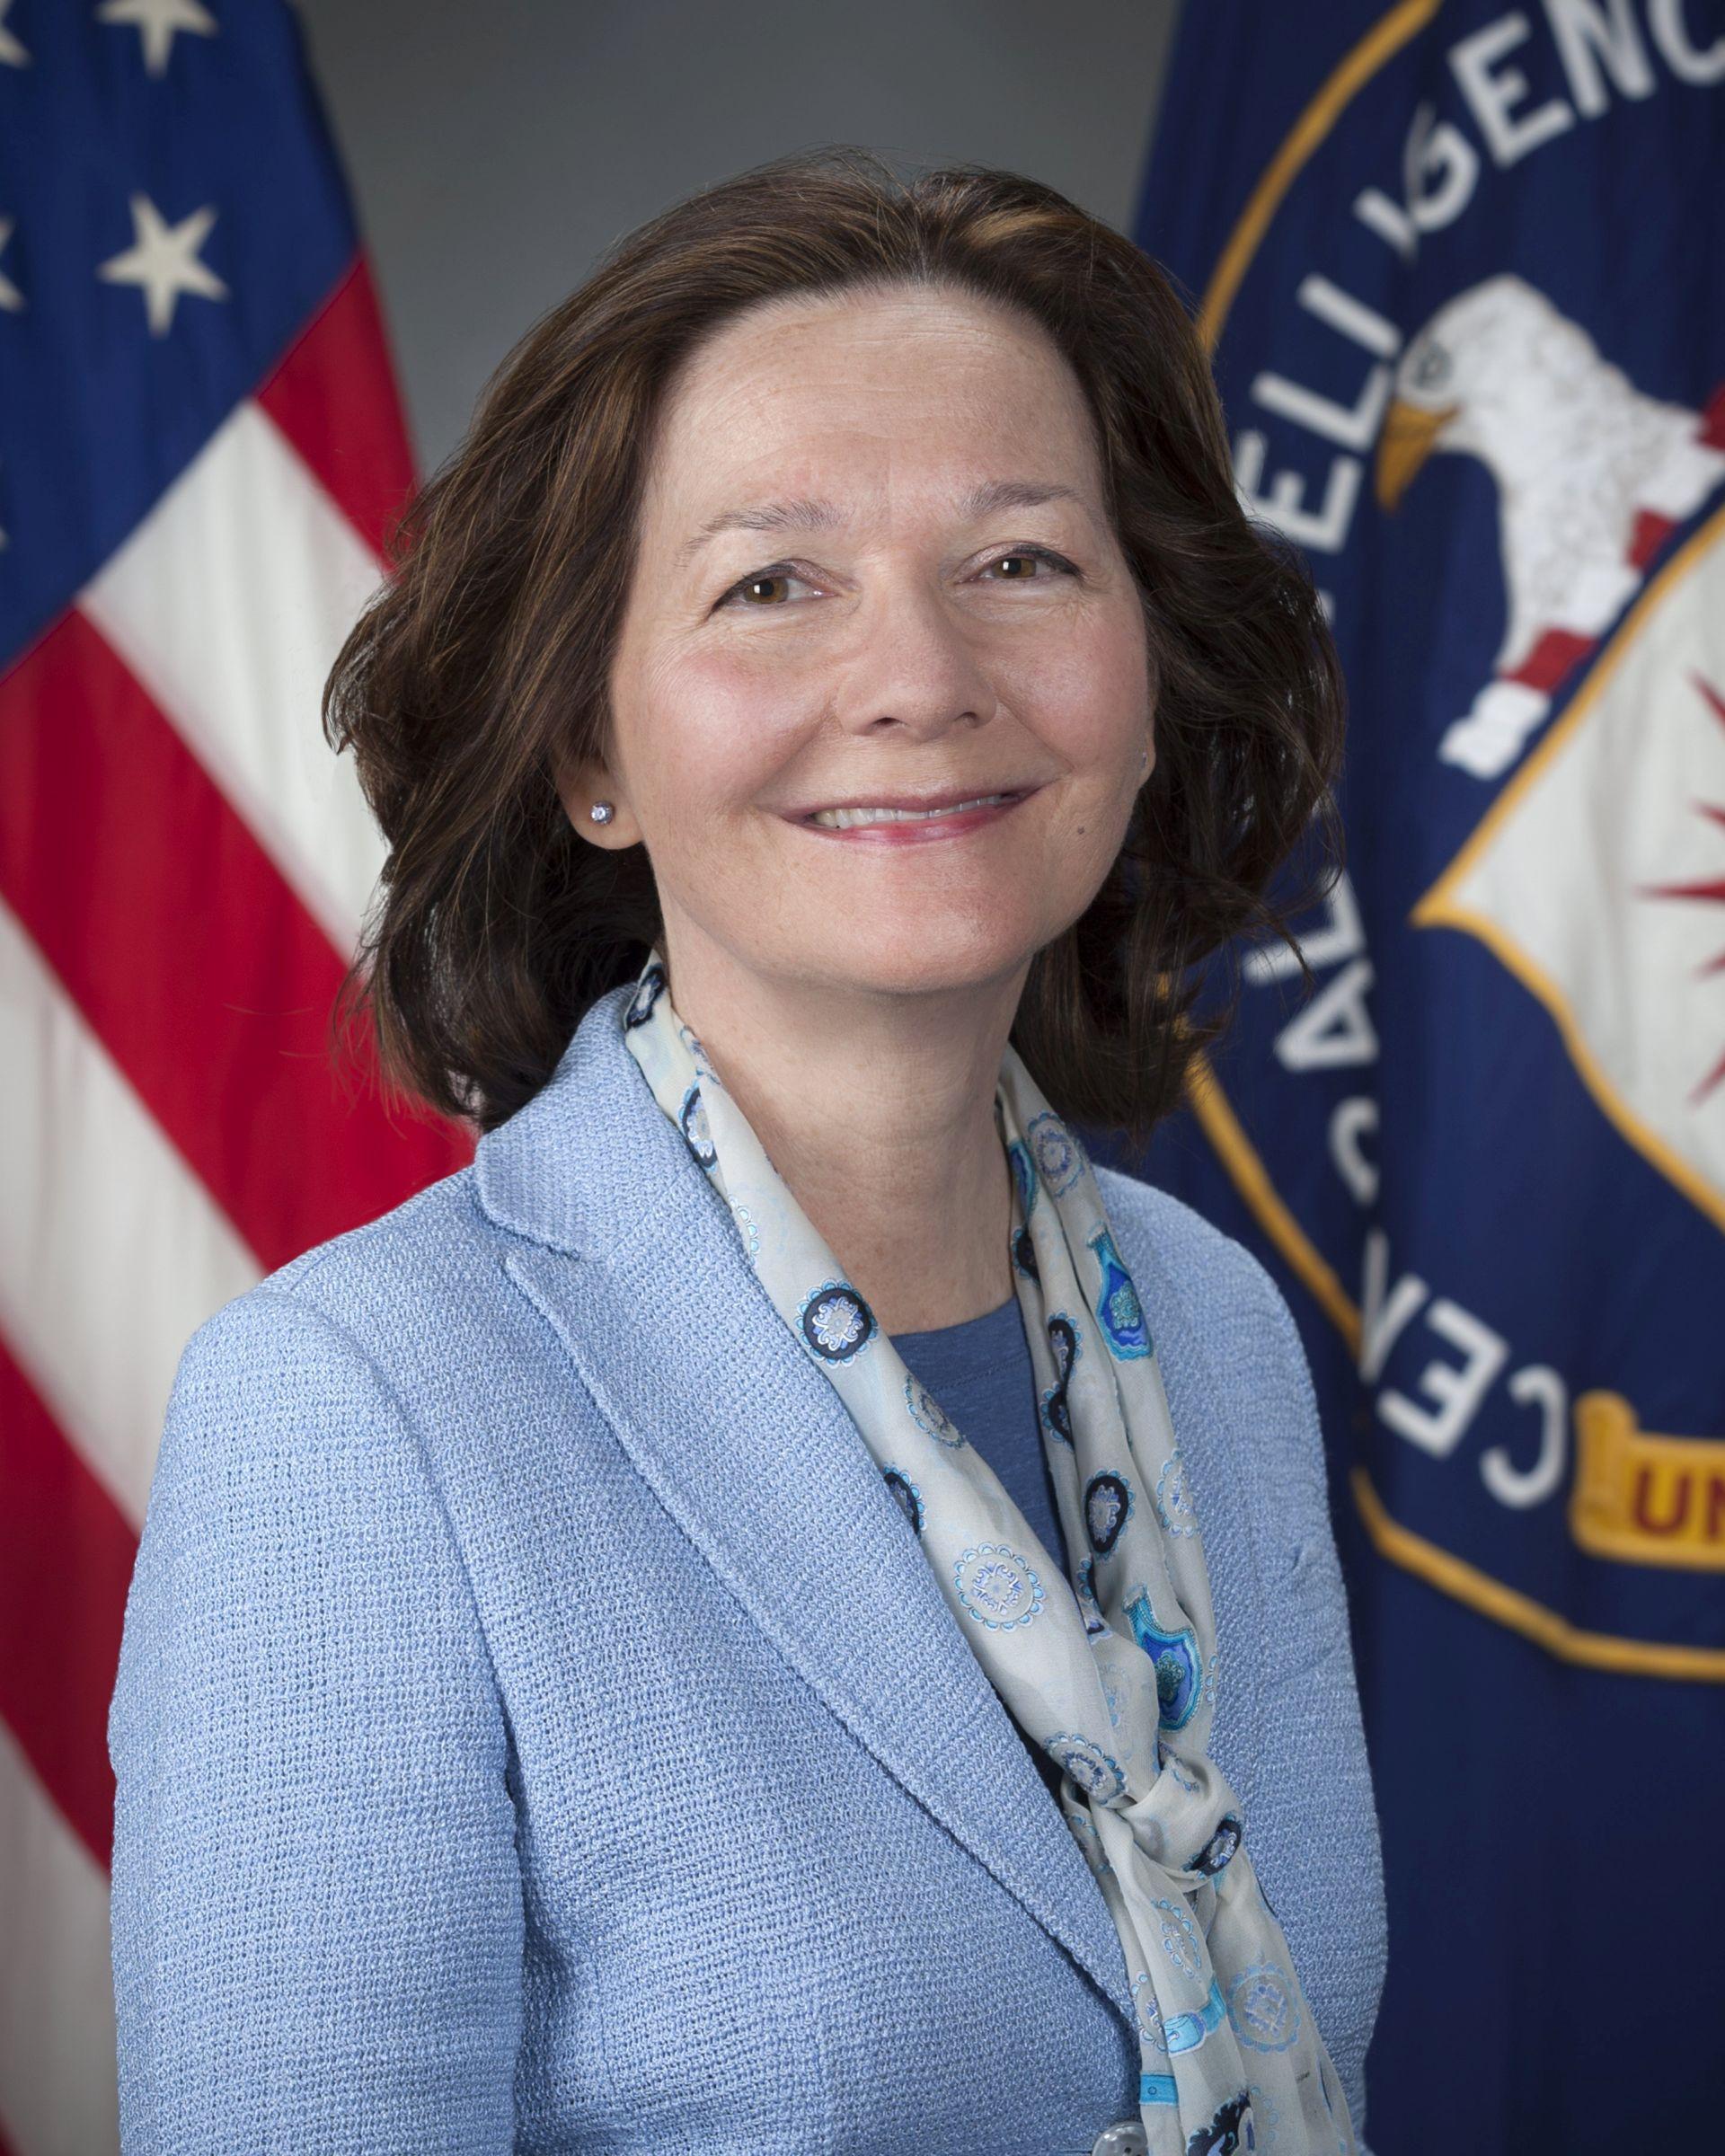 Gina Haspel, kontroverzna bivša agentica i prva žena na čelu CIA-e